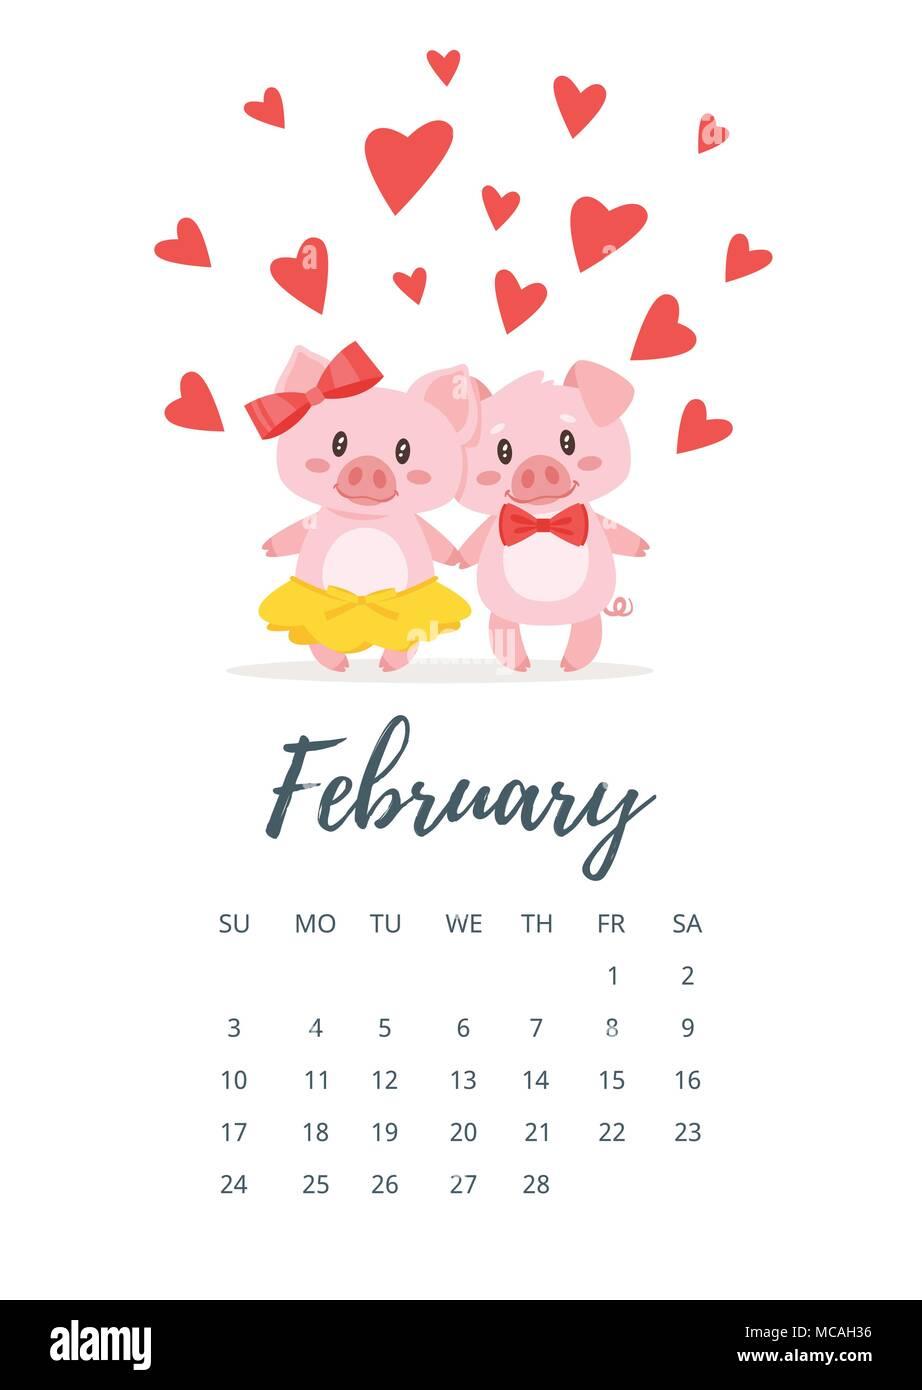 Vector Cartoon Style Illustration Of February 2019 Year Calendar